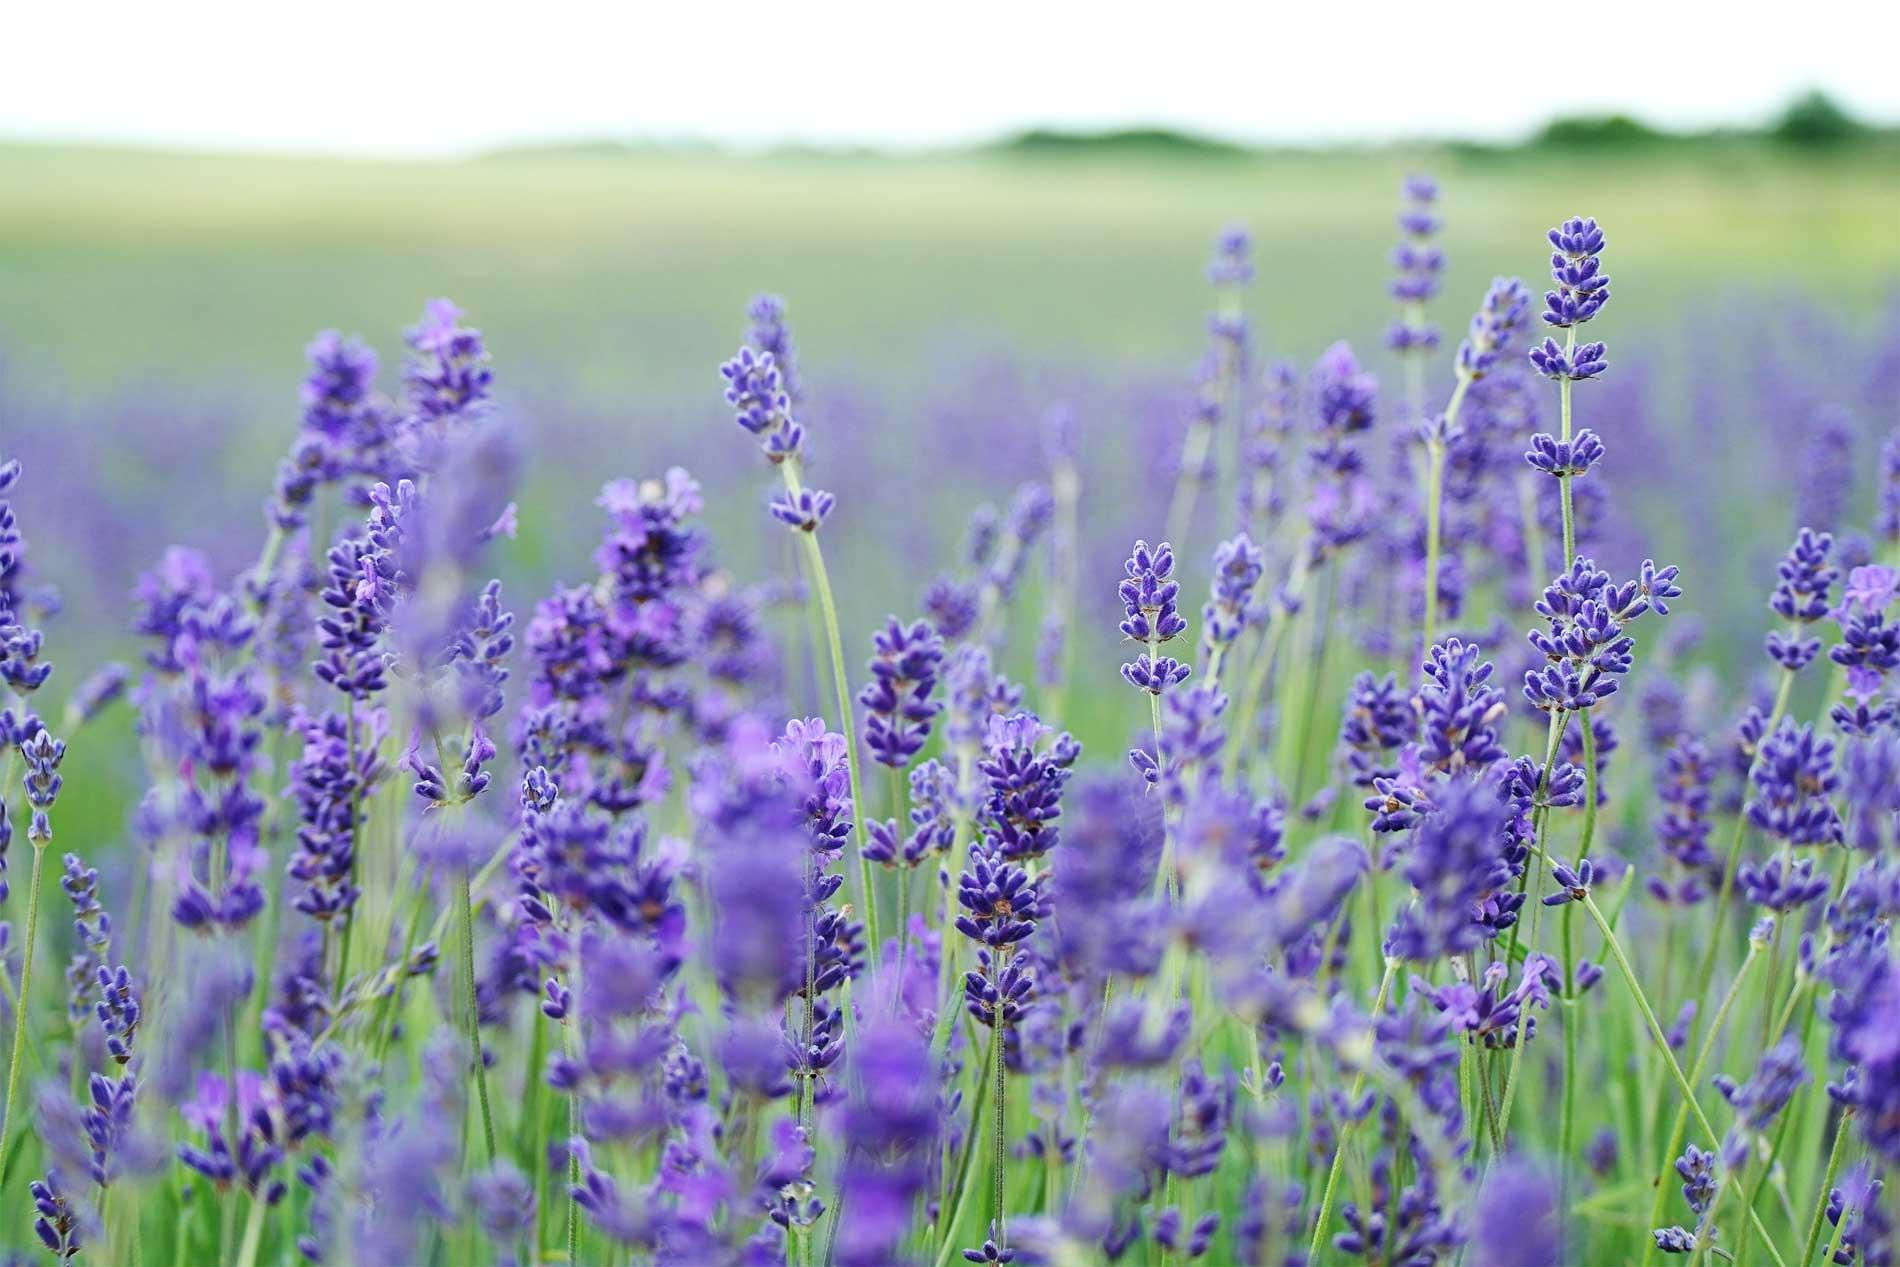 Lavendelöl, Lavendelöl Wirkung, Lavendelöl Anwendung